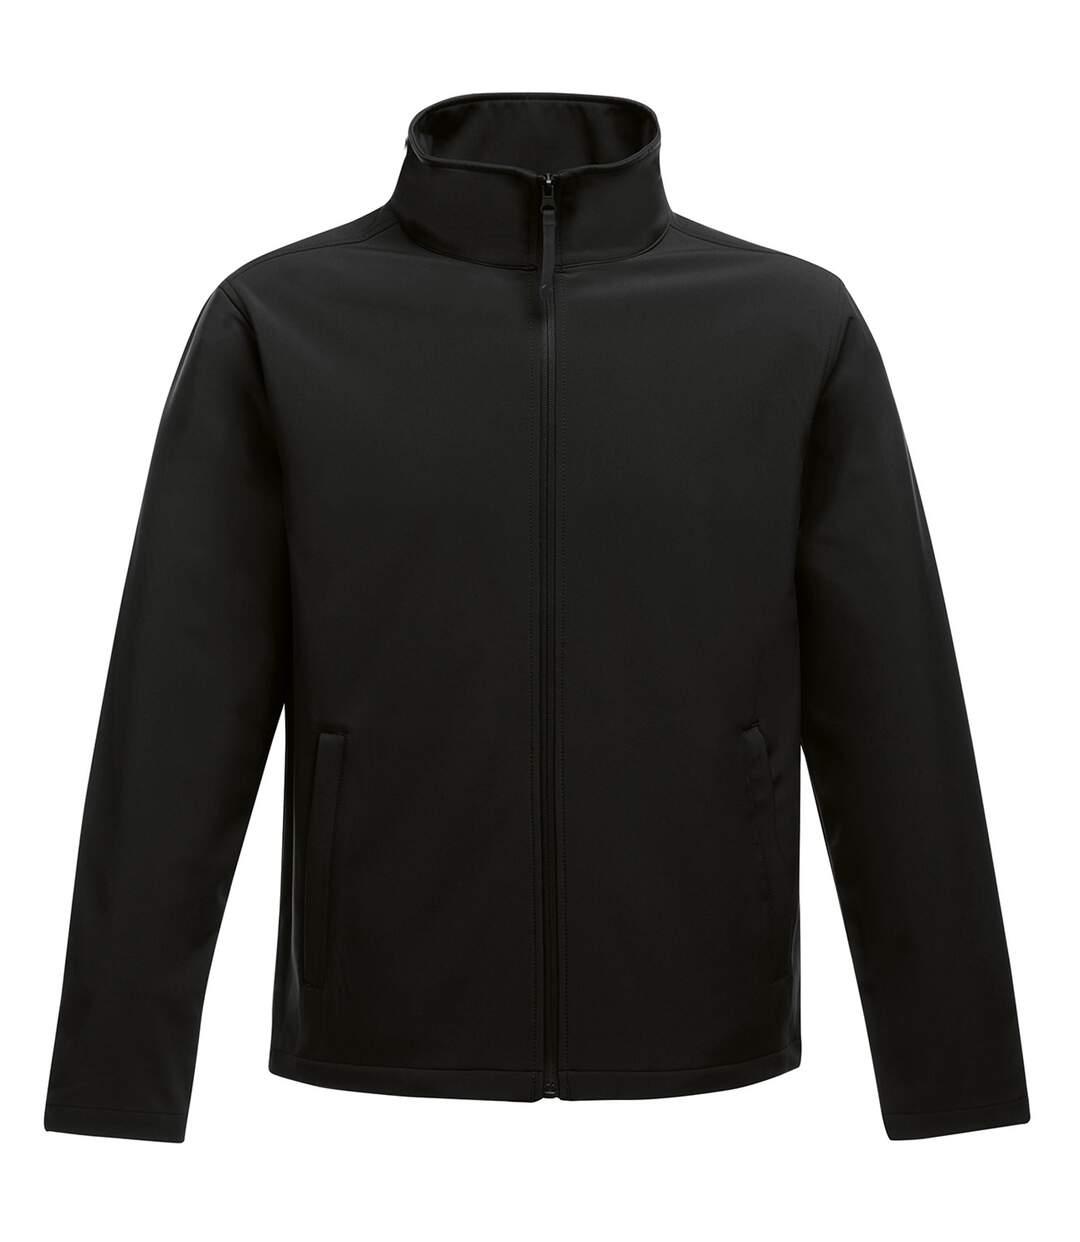 Regatta Standout Mens Ablaze Printable Softshell Jacket (Black) - UTRW6353